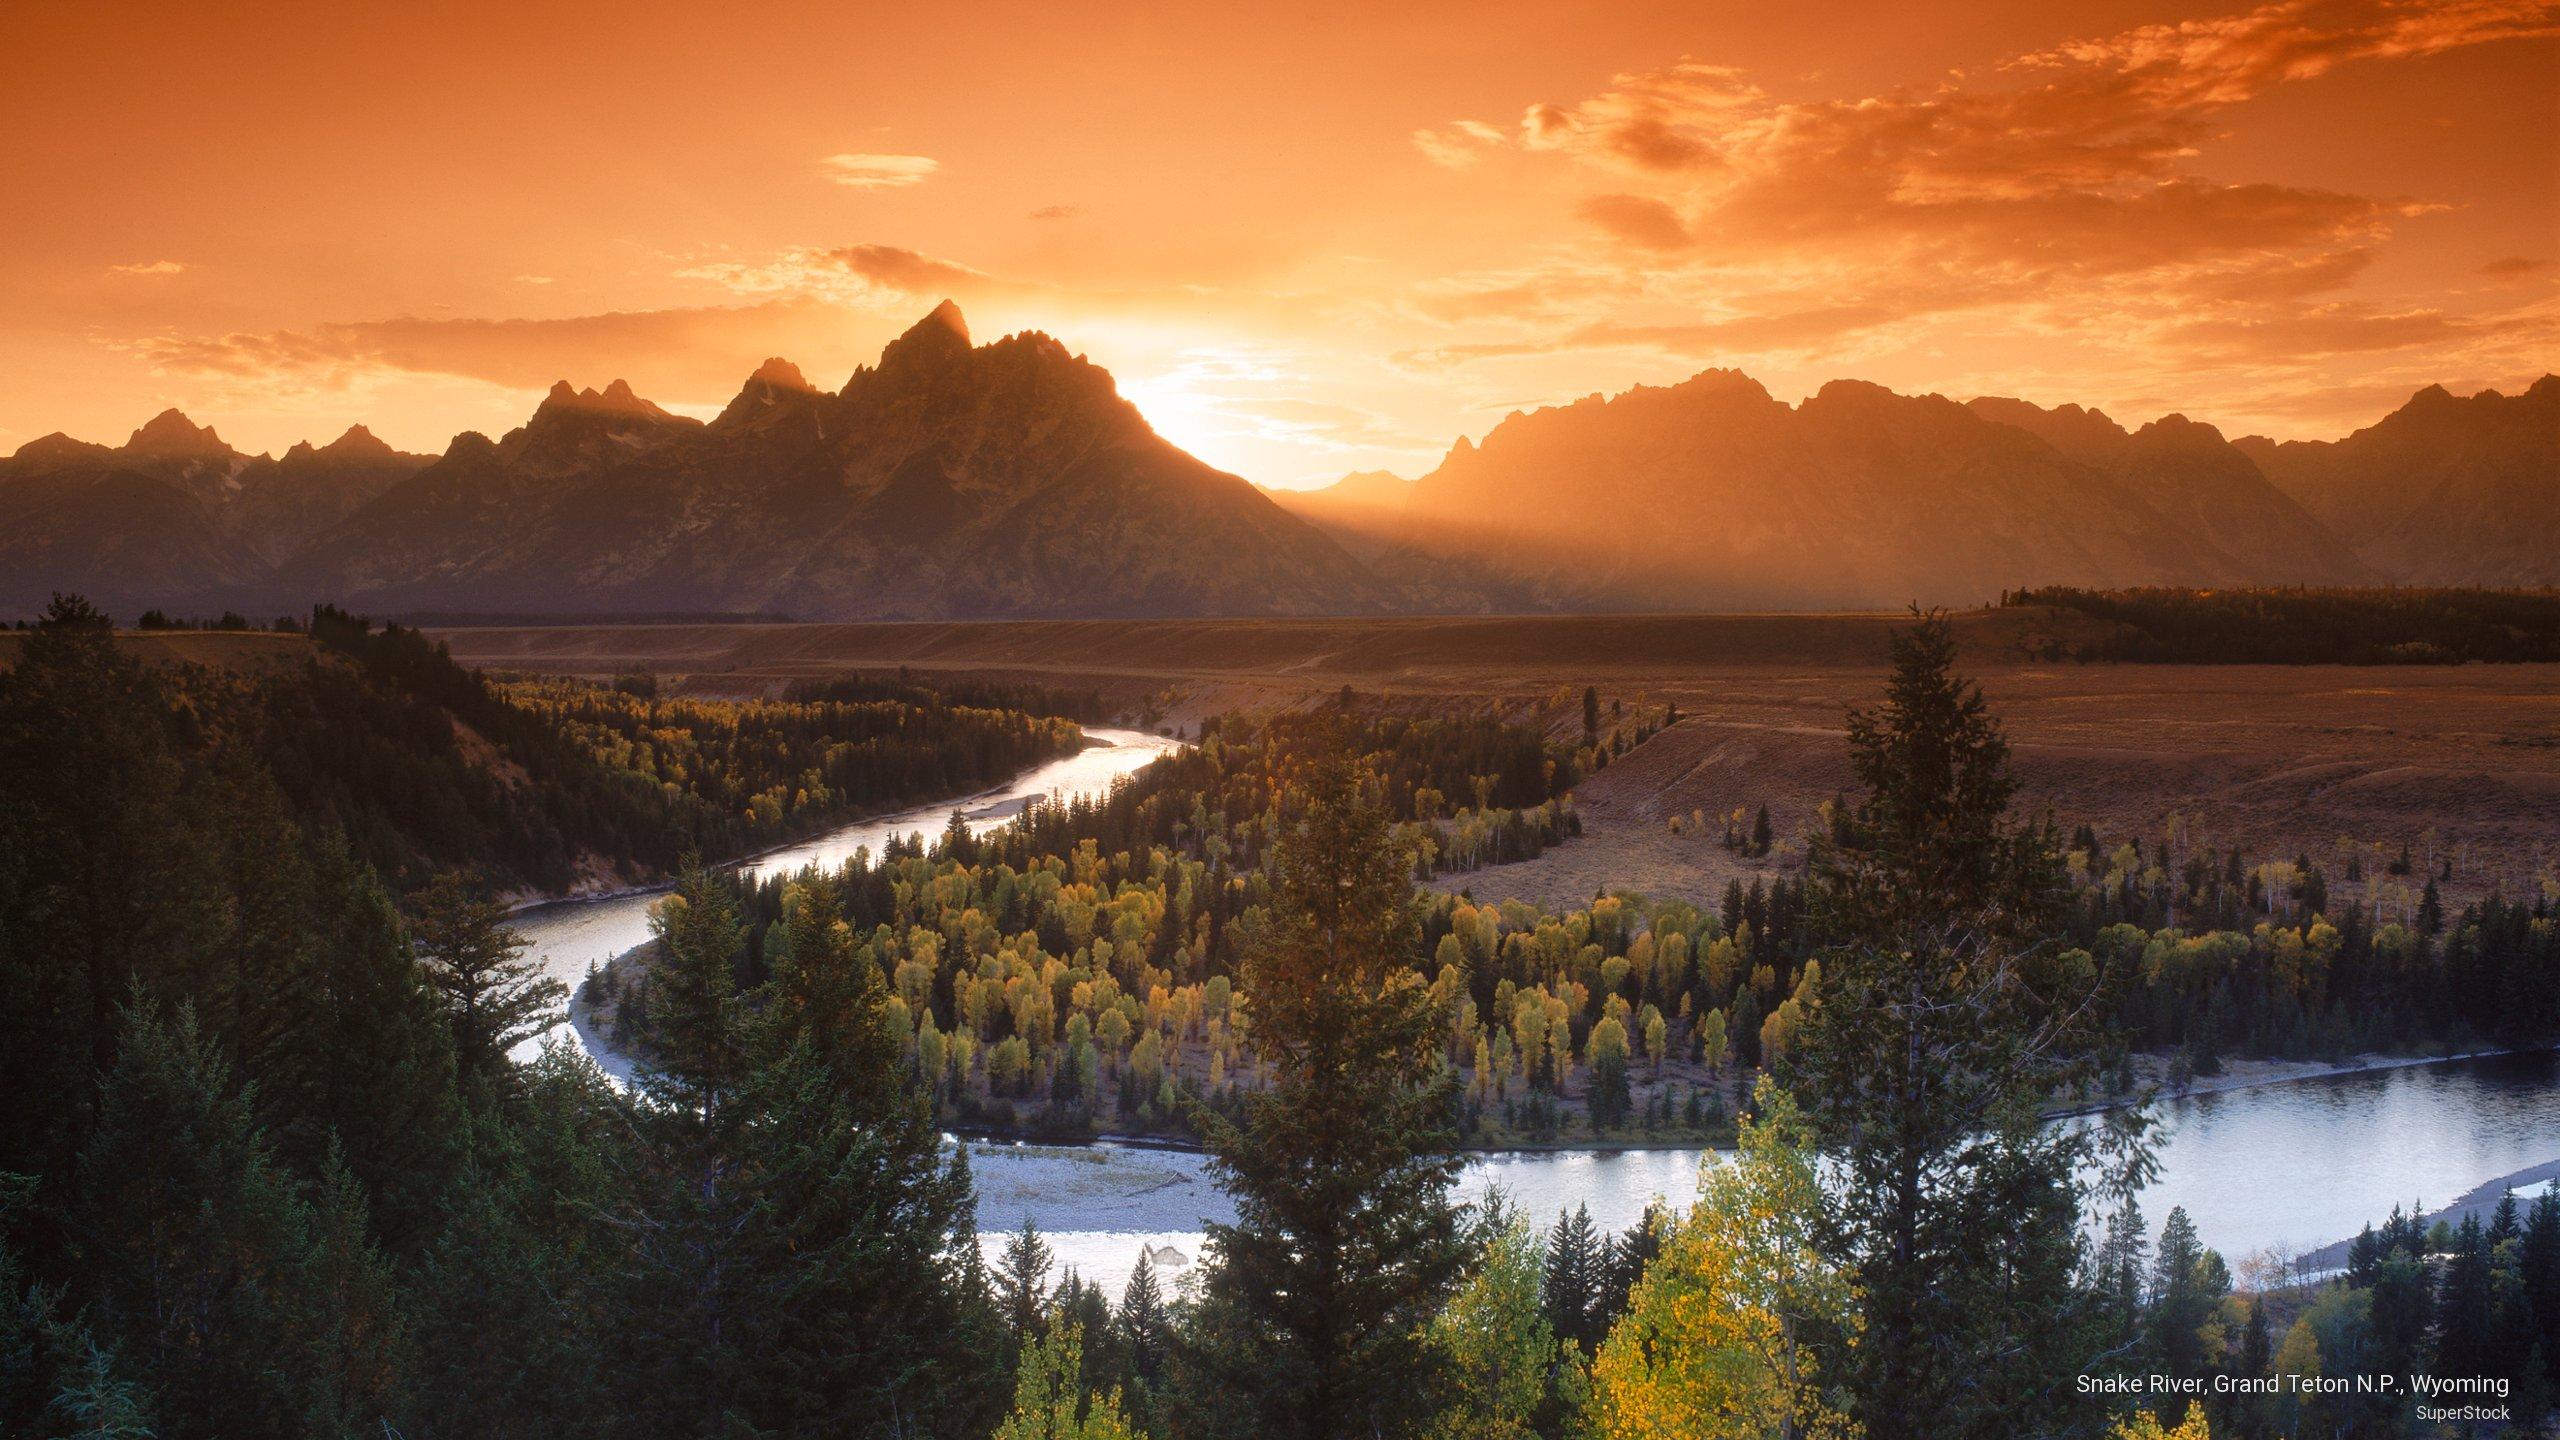 Snake River Grand Tetons National Park Near Jackson Hole Wyoming 2560x1440